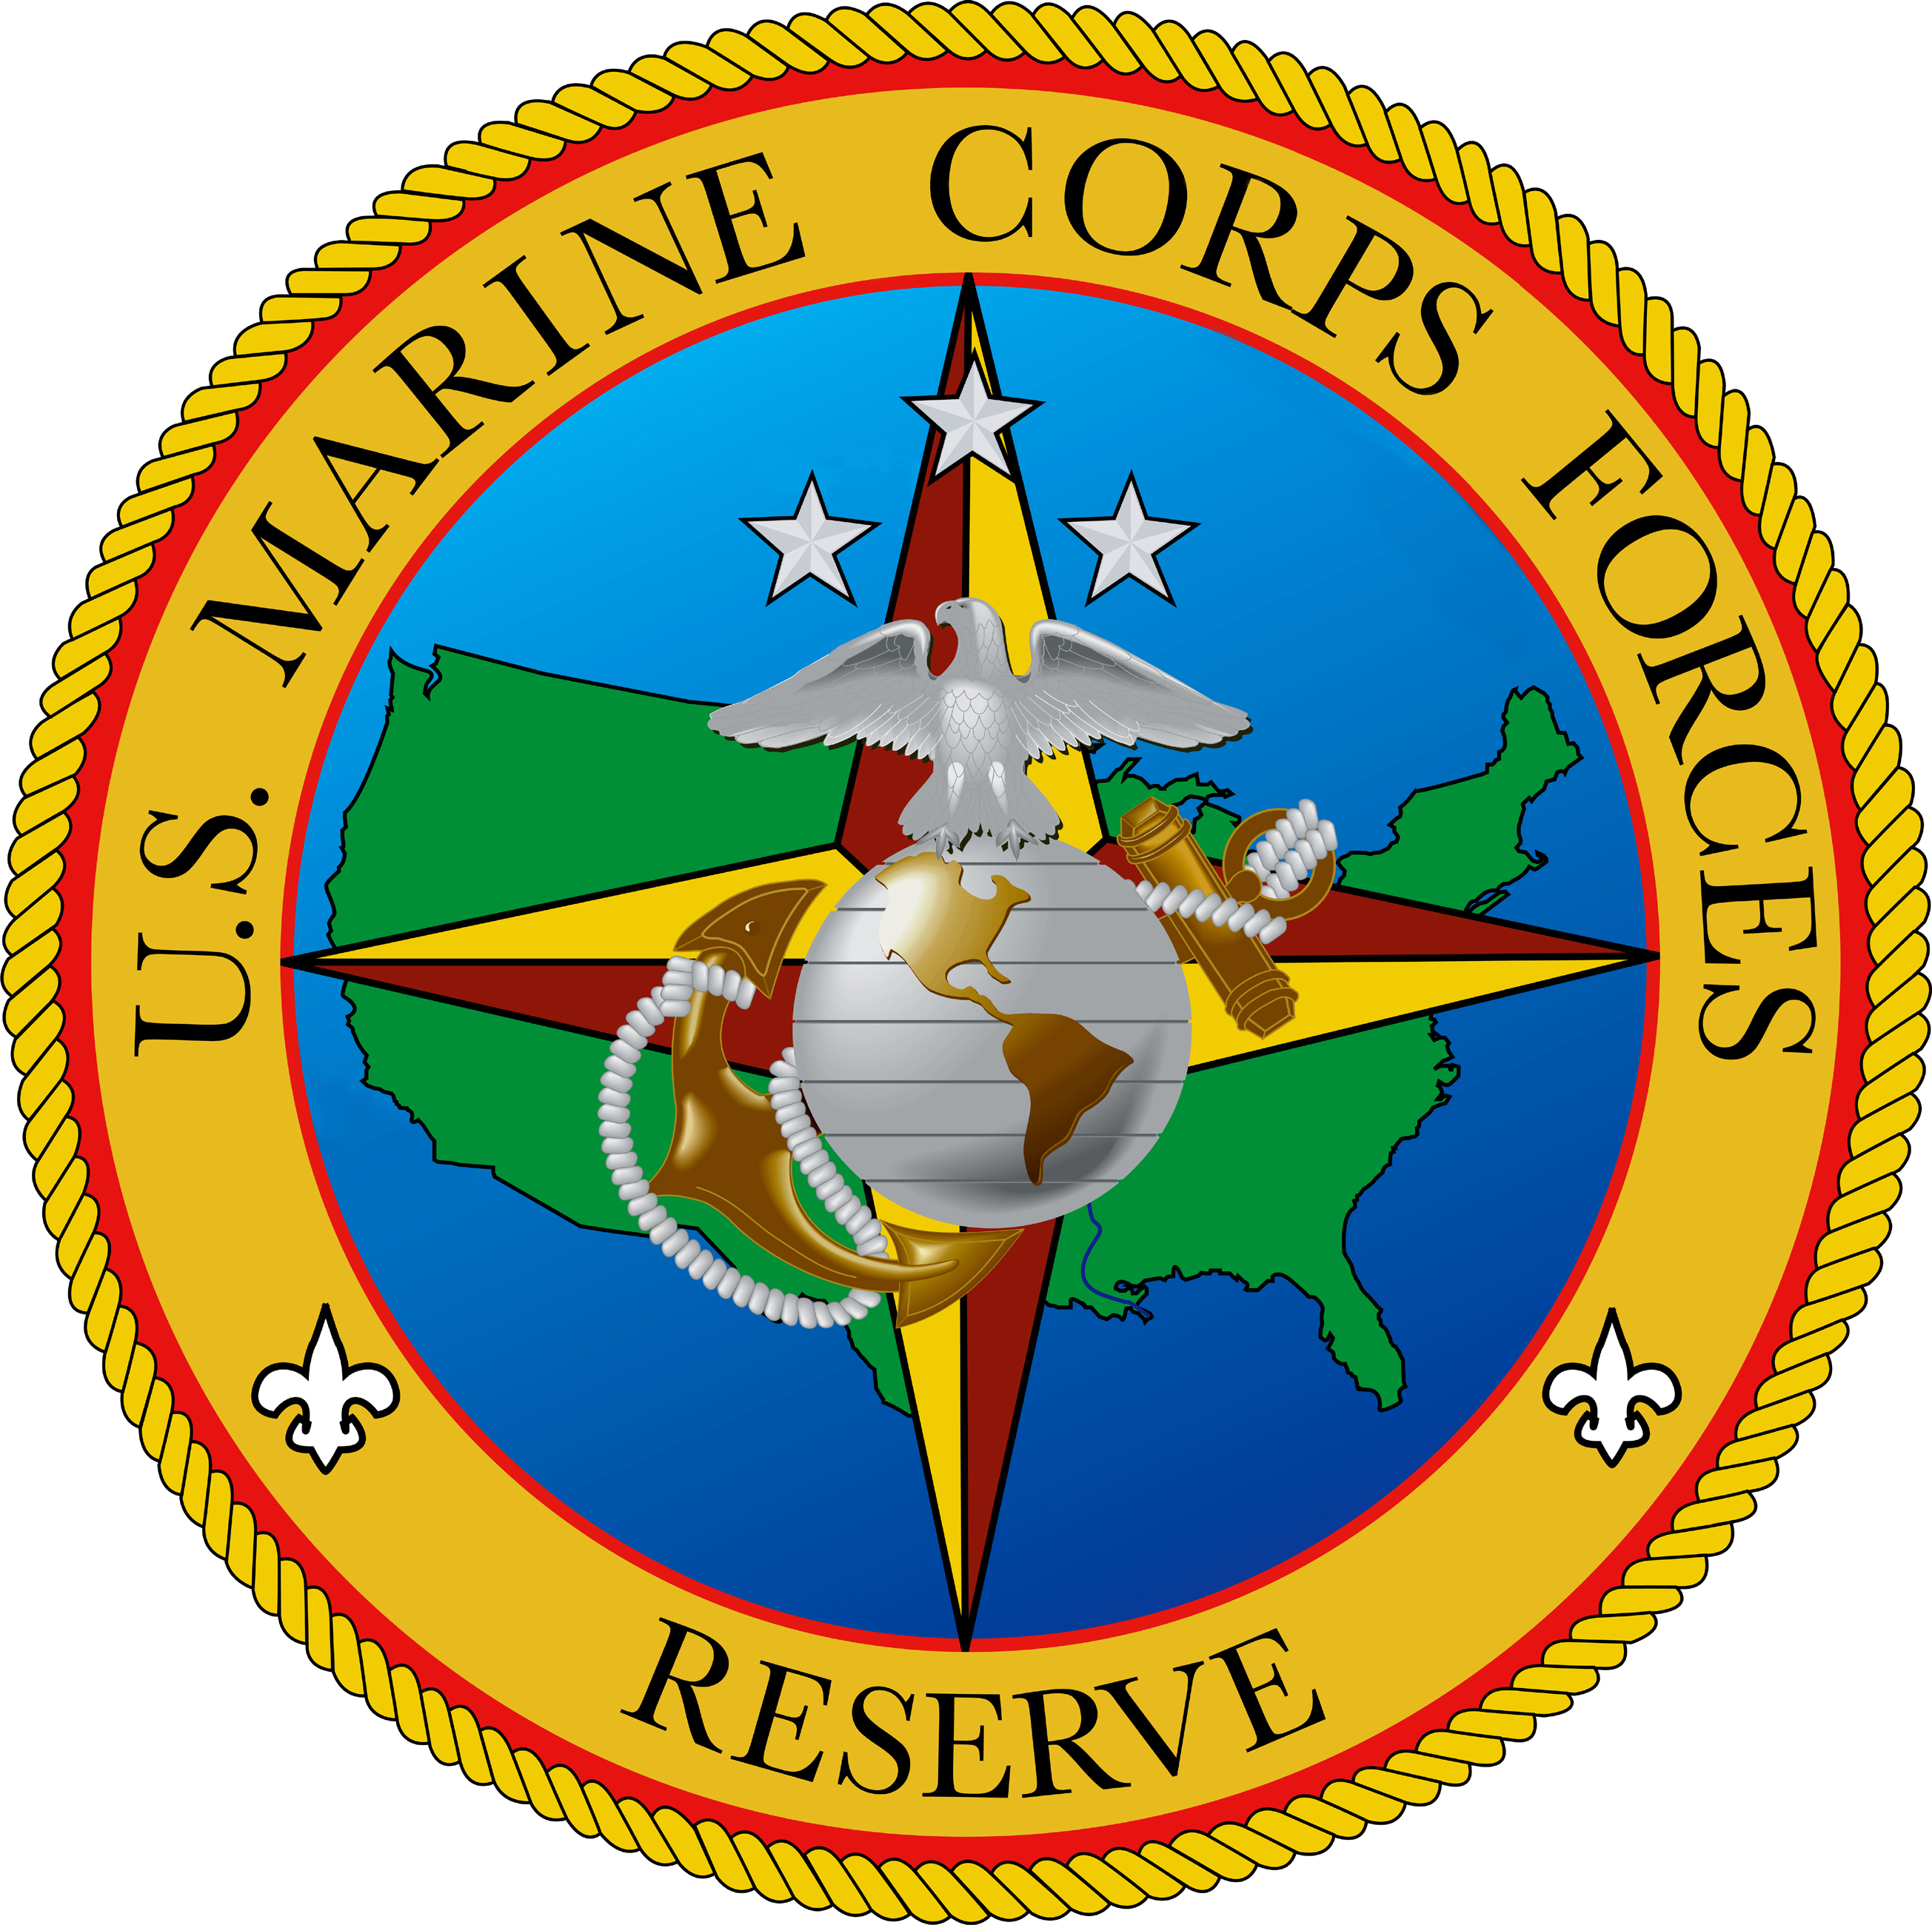 marine corps emblem pictures clipart best marine corps emblem clip art veterans Marine Corps Emblem Vector